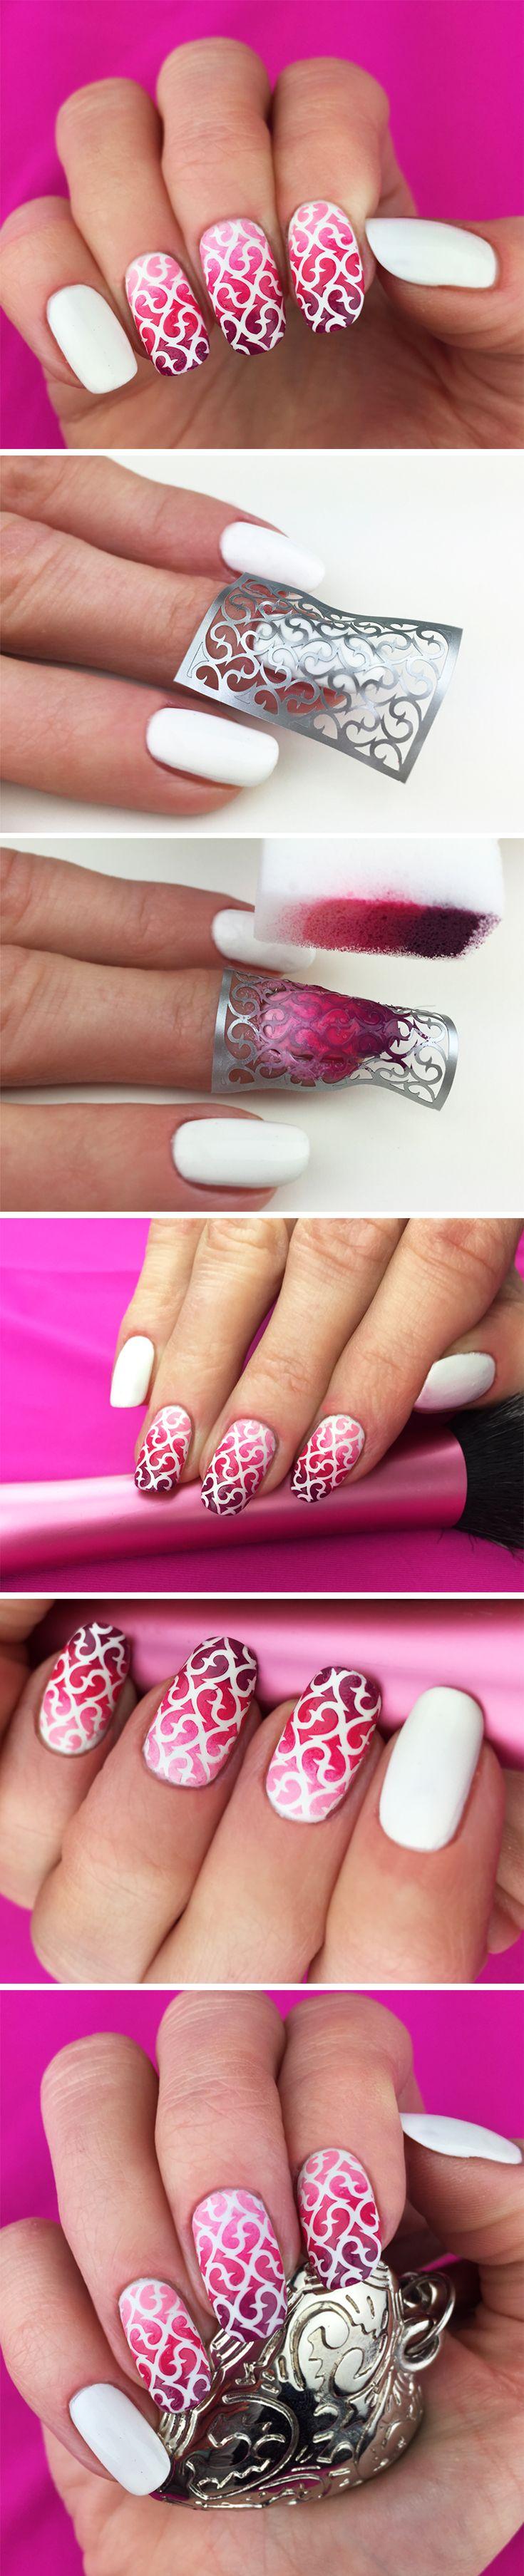 "Nail Stencils design ""Sixty Nine"" by Unail $5 #nails #nailart #naildesign #easynail #nailstencil #nailpattern ✿ @EstellaSeraphim ✿"